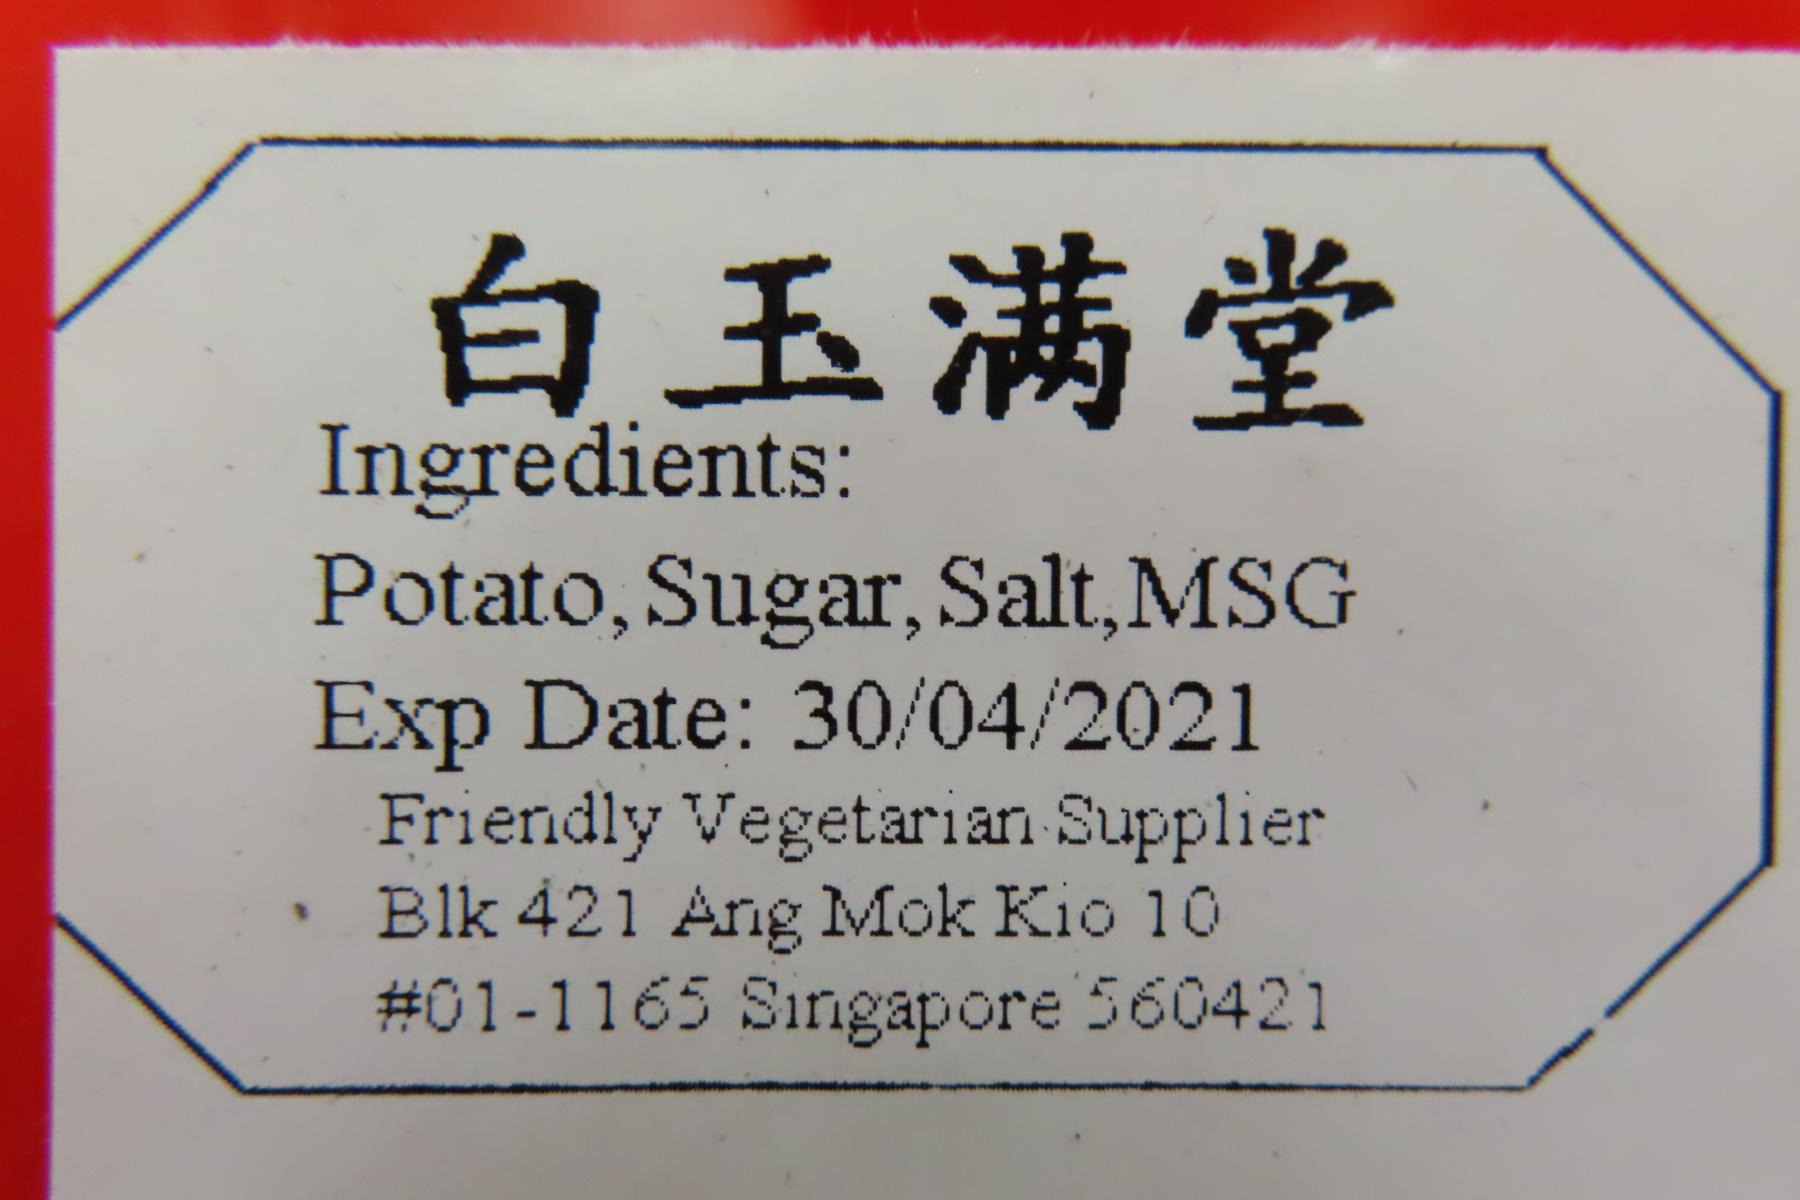 Image Fries Snacks 白玉满堂 (纯素)190grams